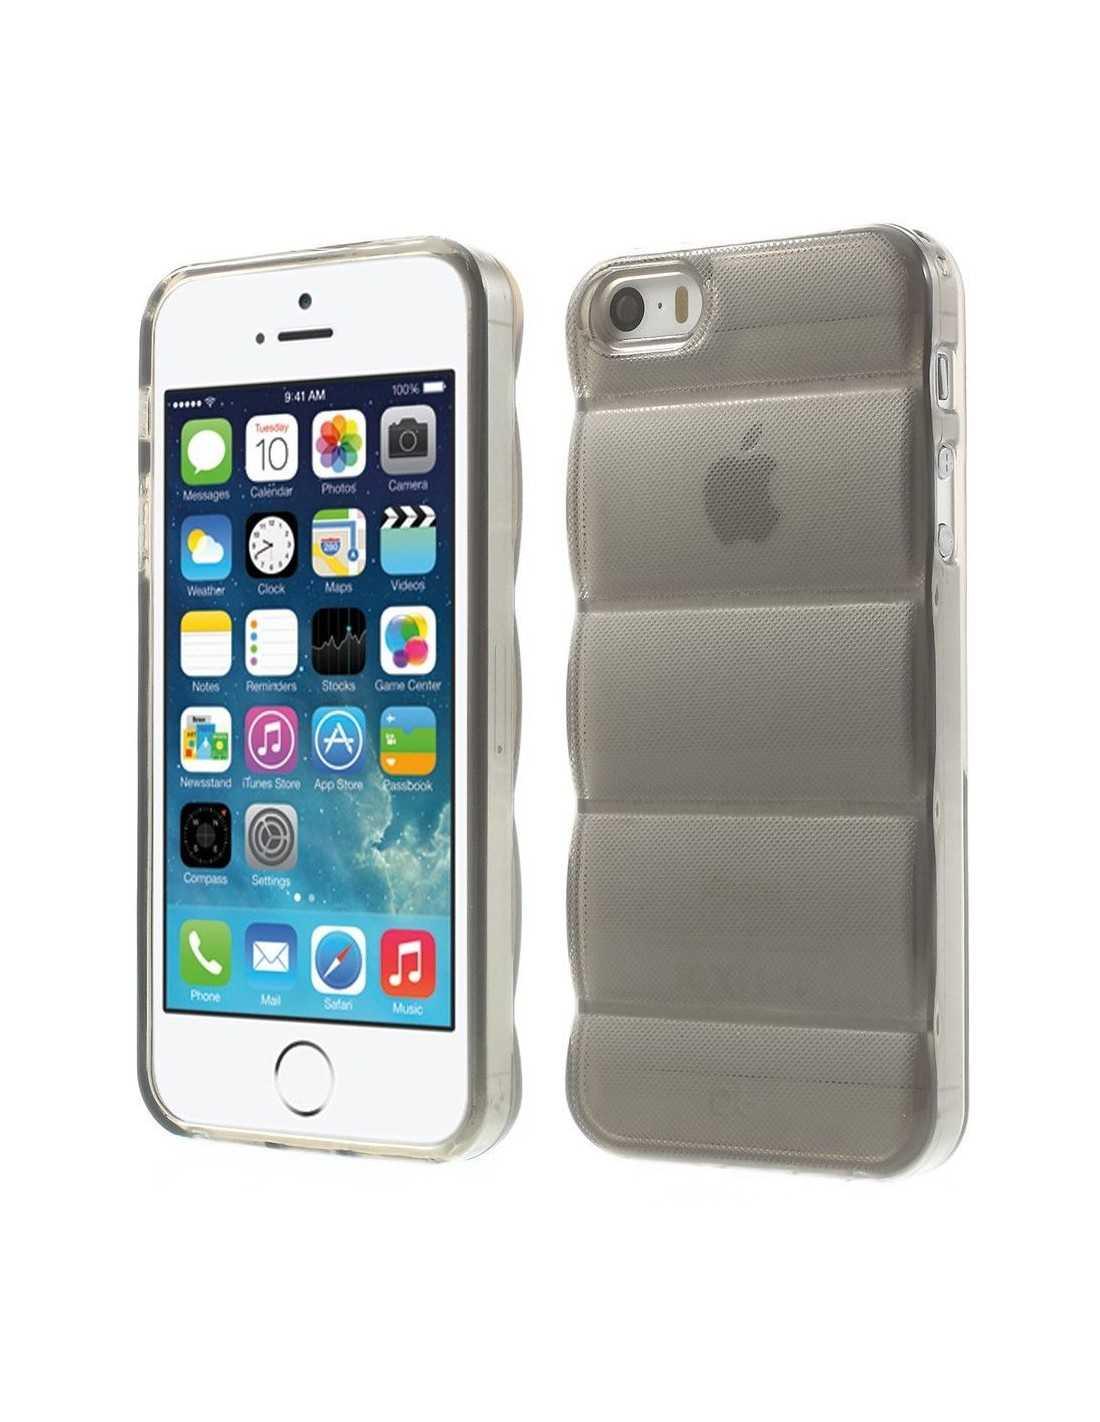 coque iphone 5s 5 silicone design body armor